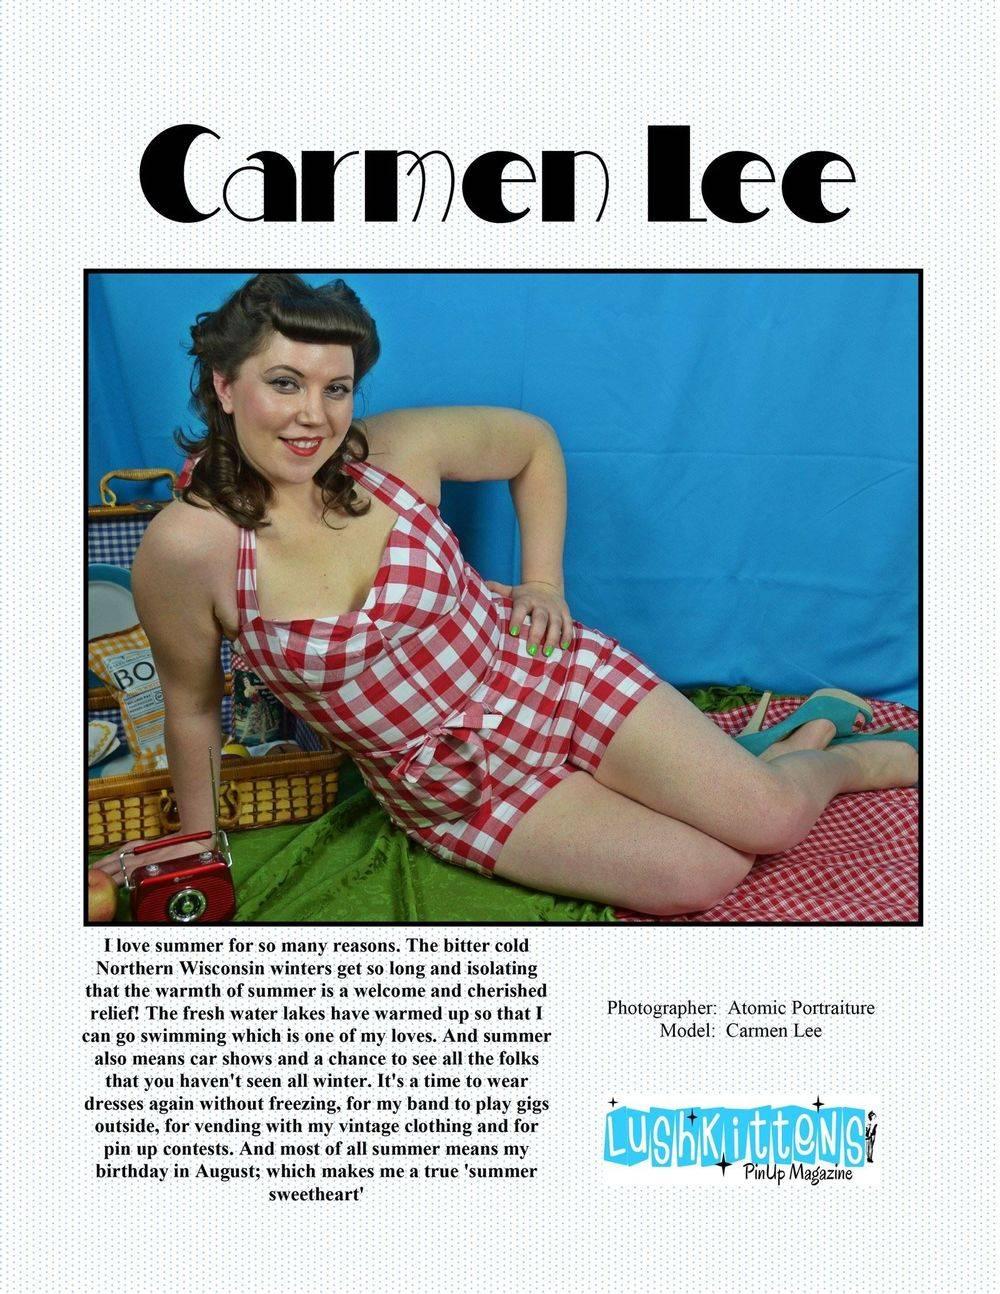 Lush Kittens Pinup Magazine Summertime Sweeties Edition